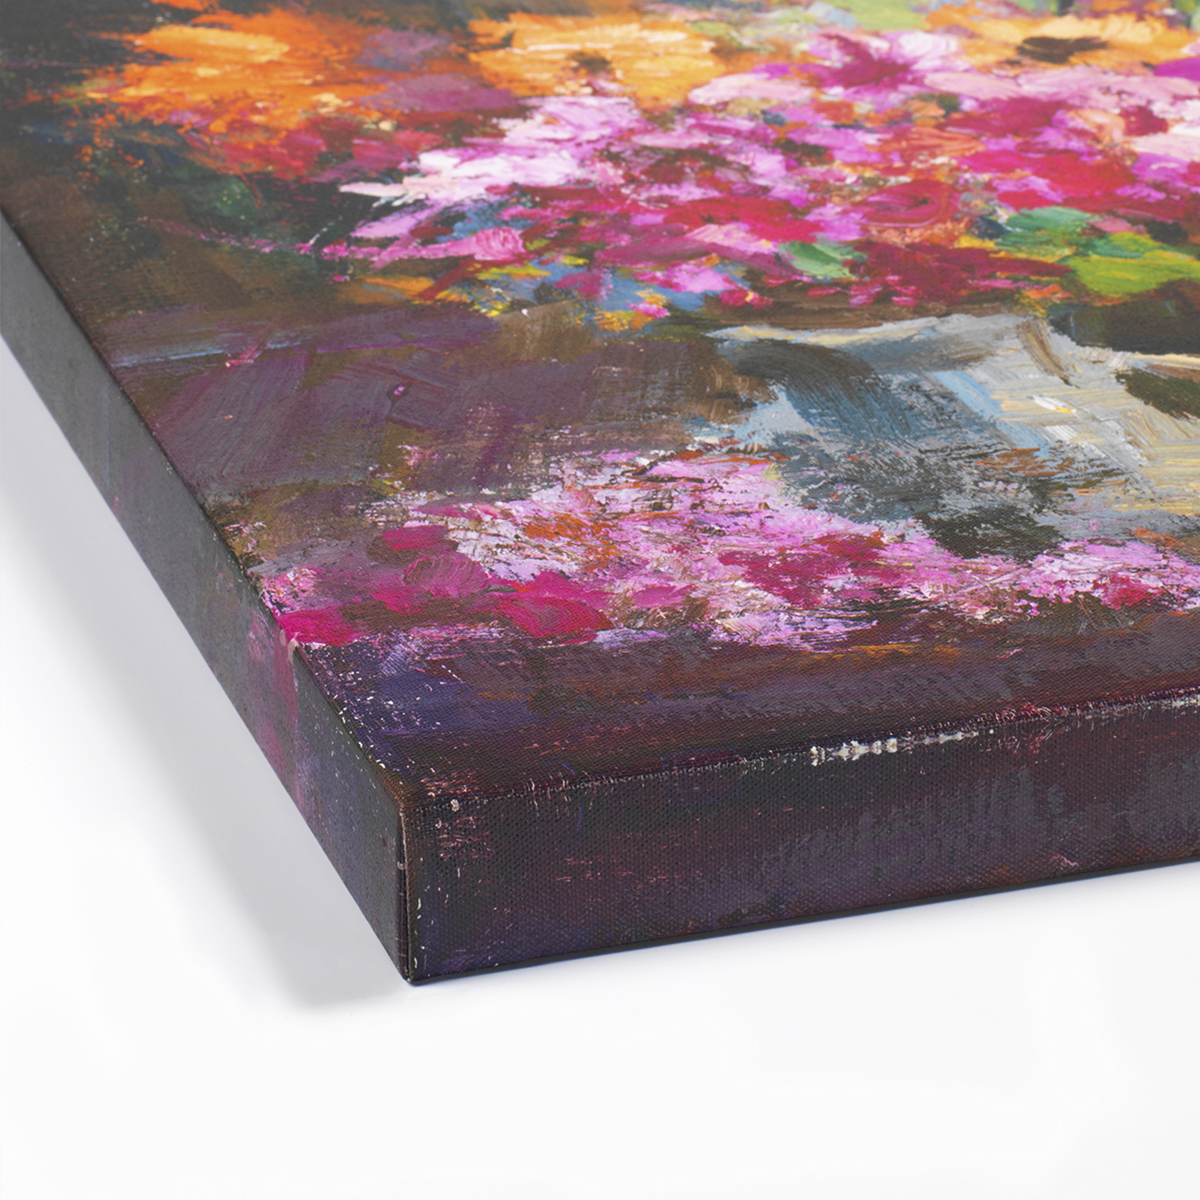 Custom High quality Digital Photo to Canvas prints gallery wrap